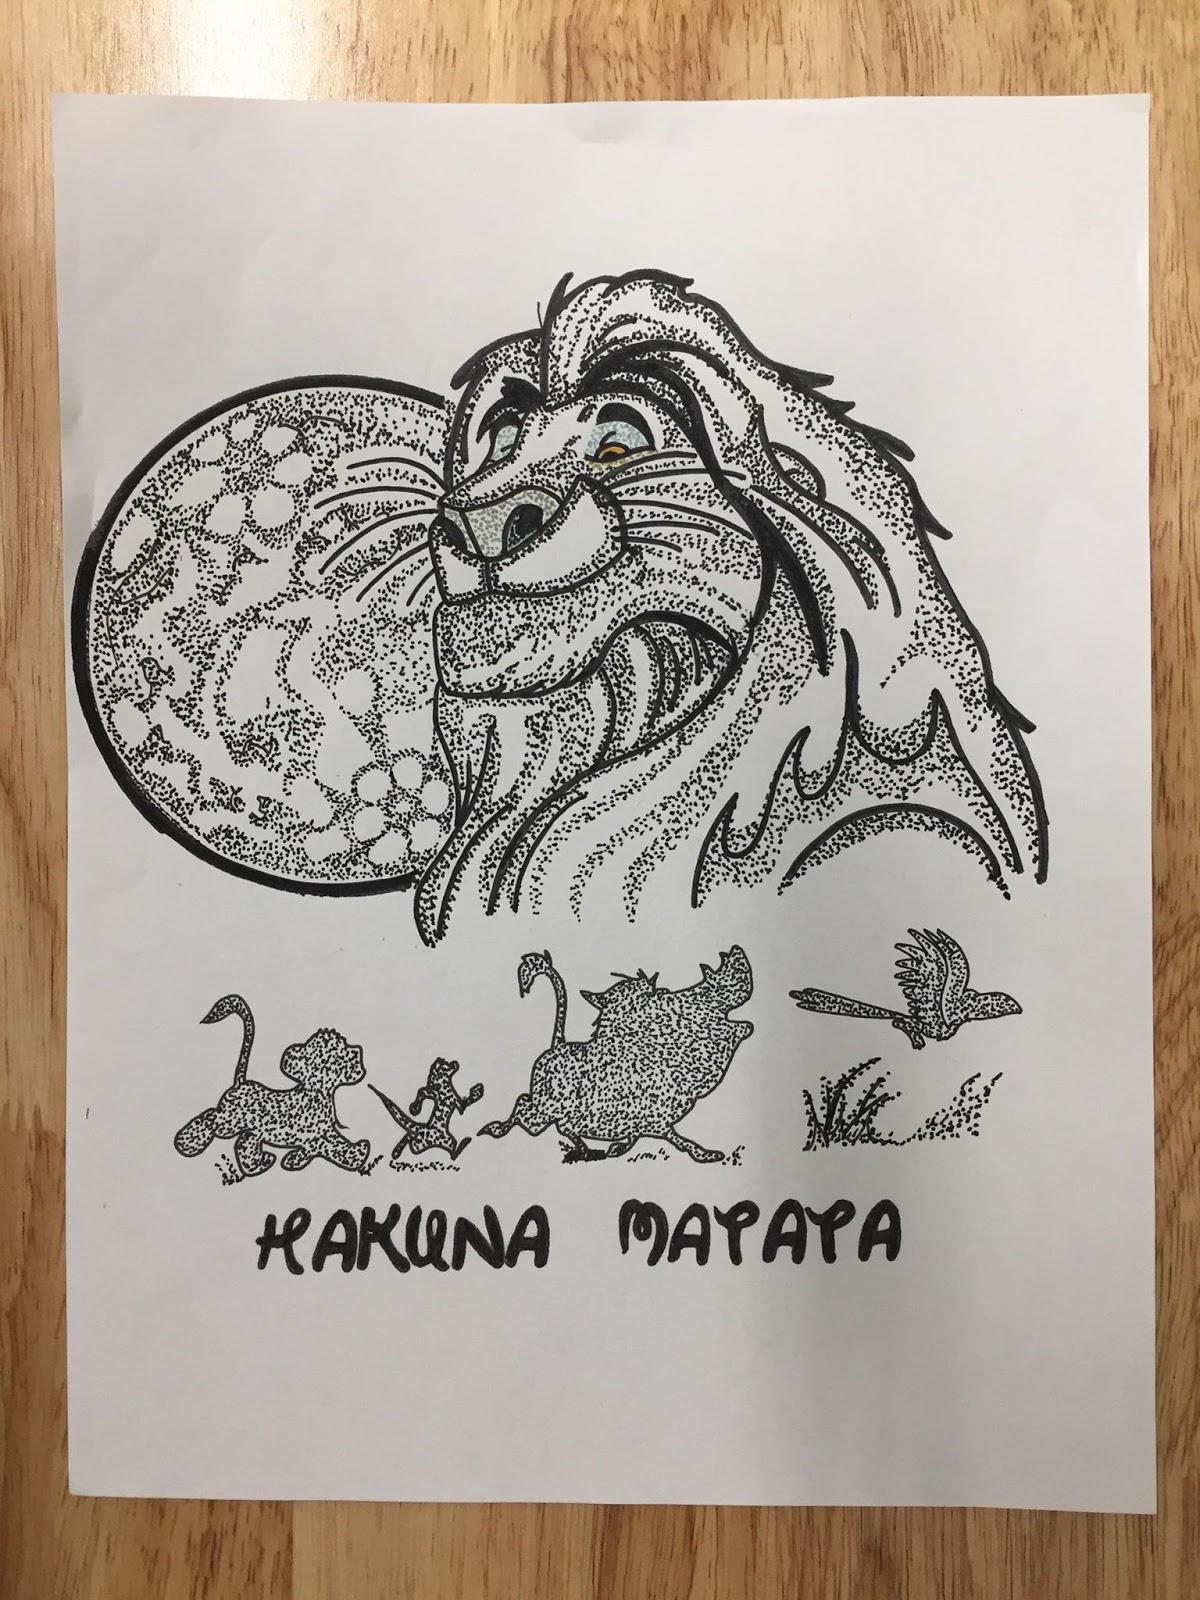 A Corbin Says What The Lion King Hakuna Matata Flash For Sale By Mario Rj Corbin